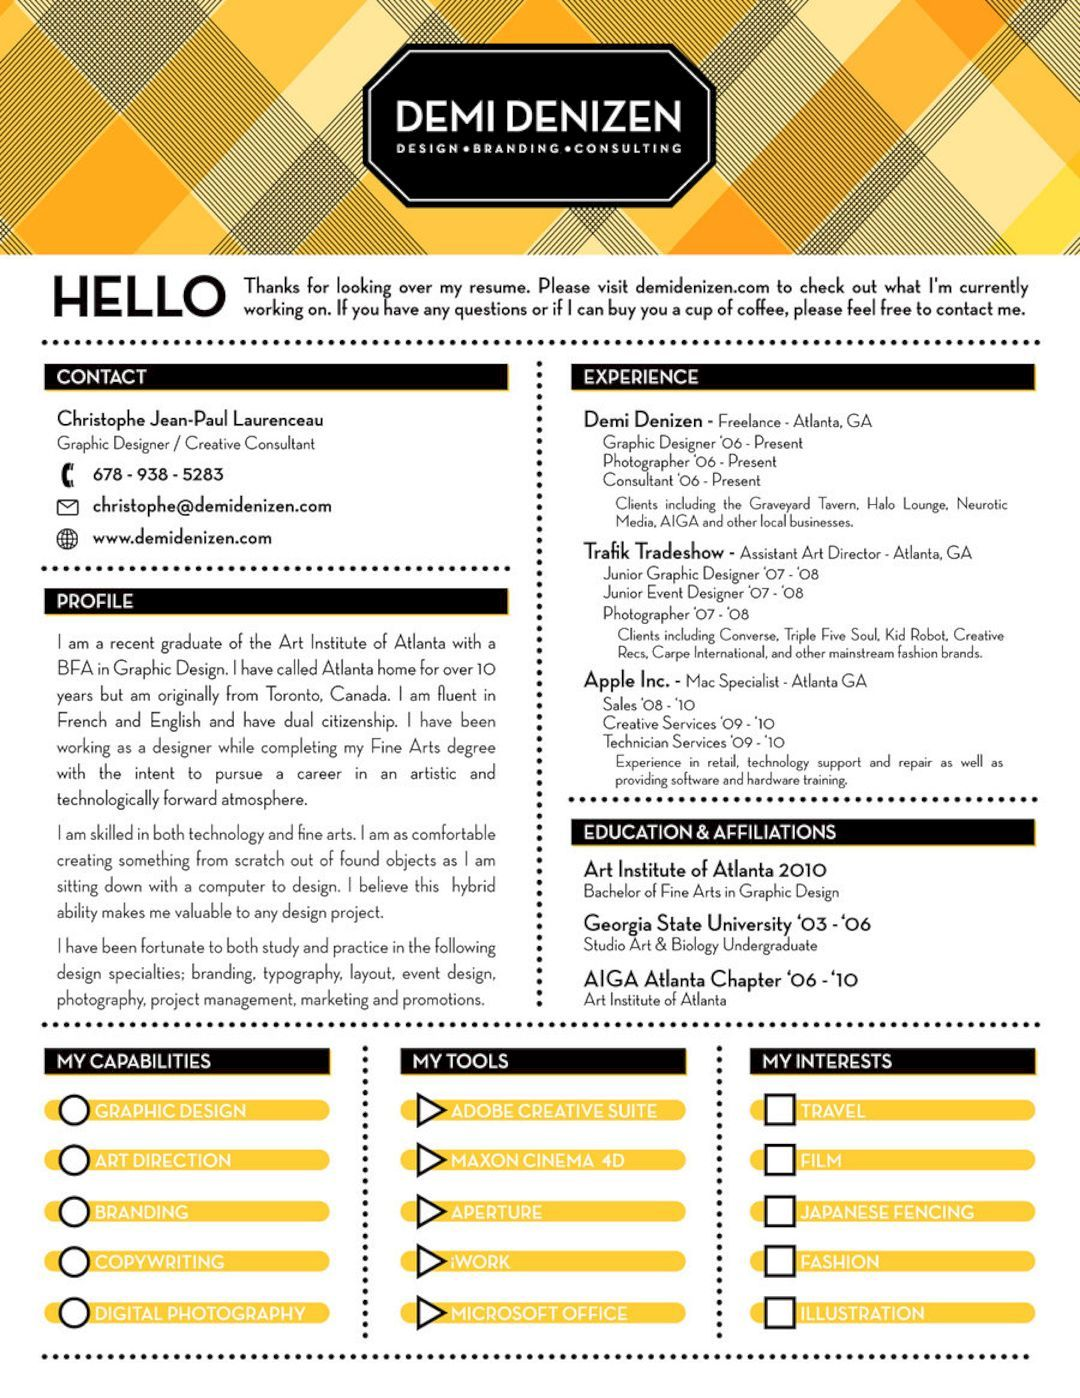 61 Cool Resume Design Ideas Resume ideas